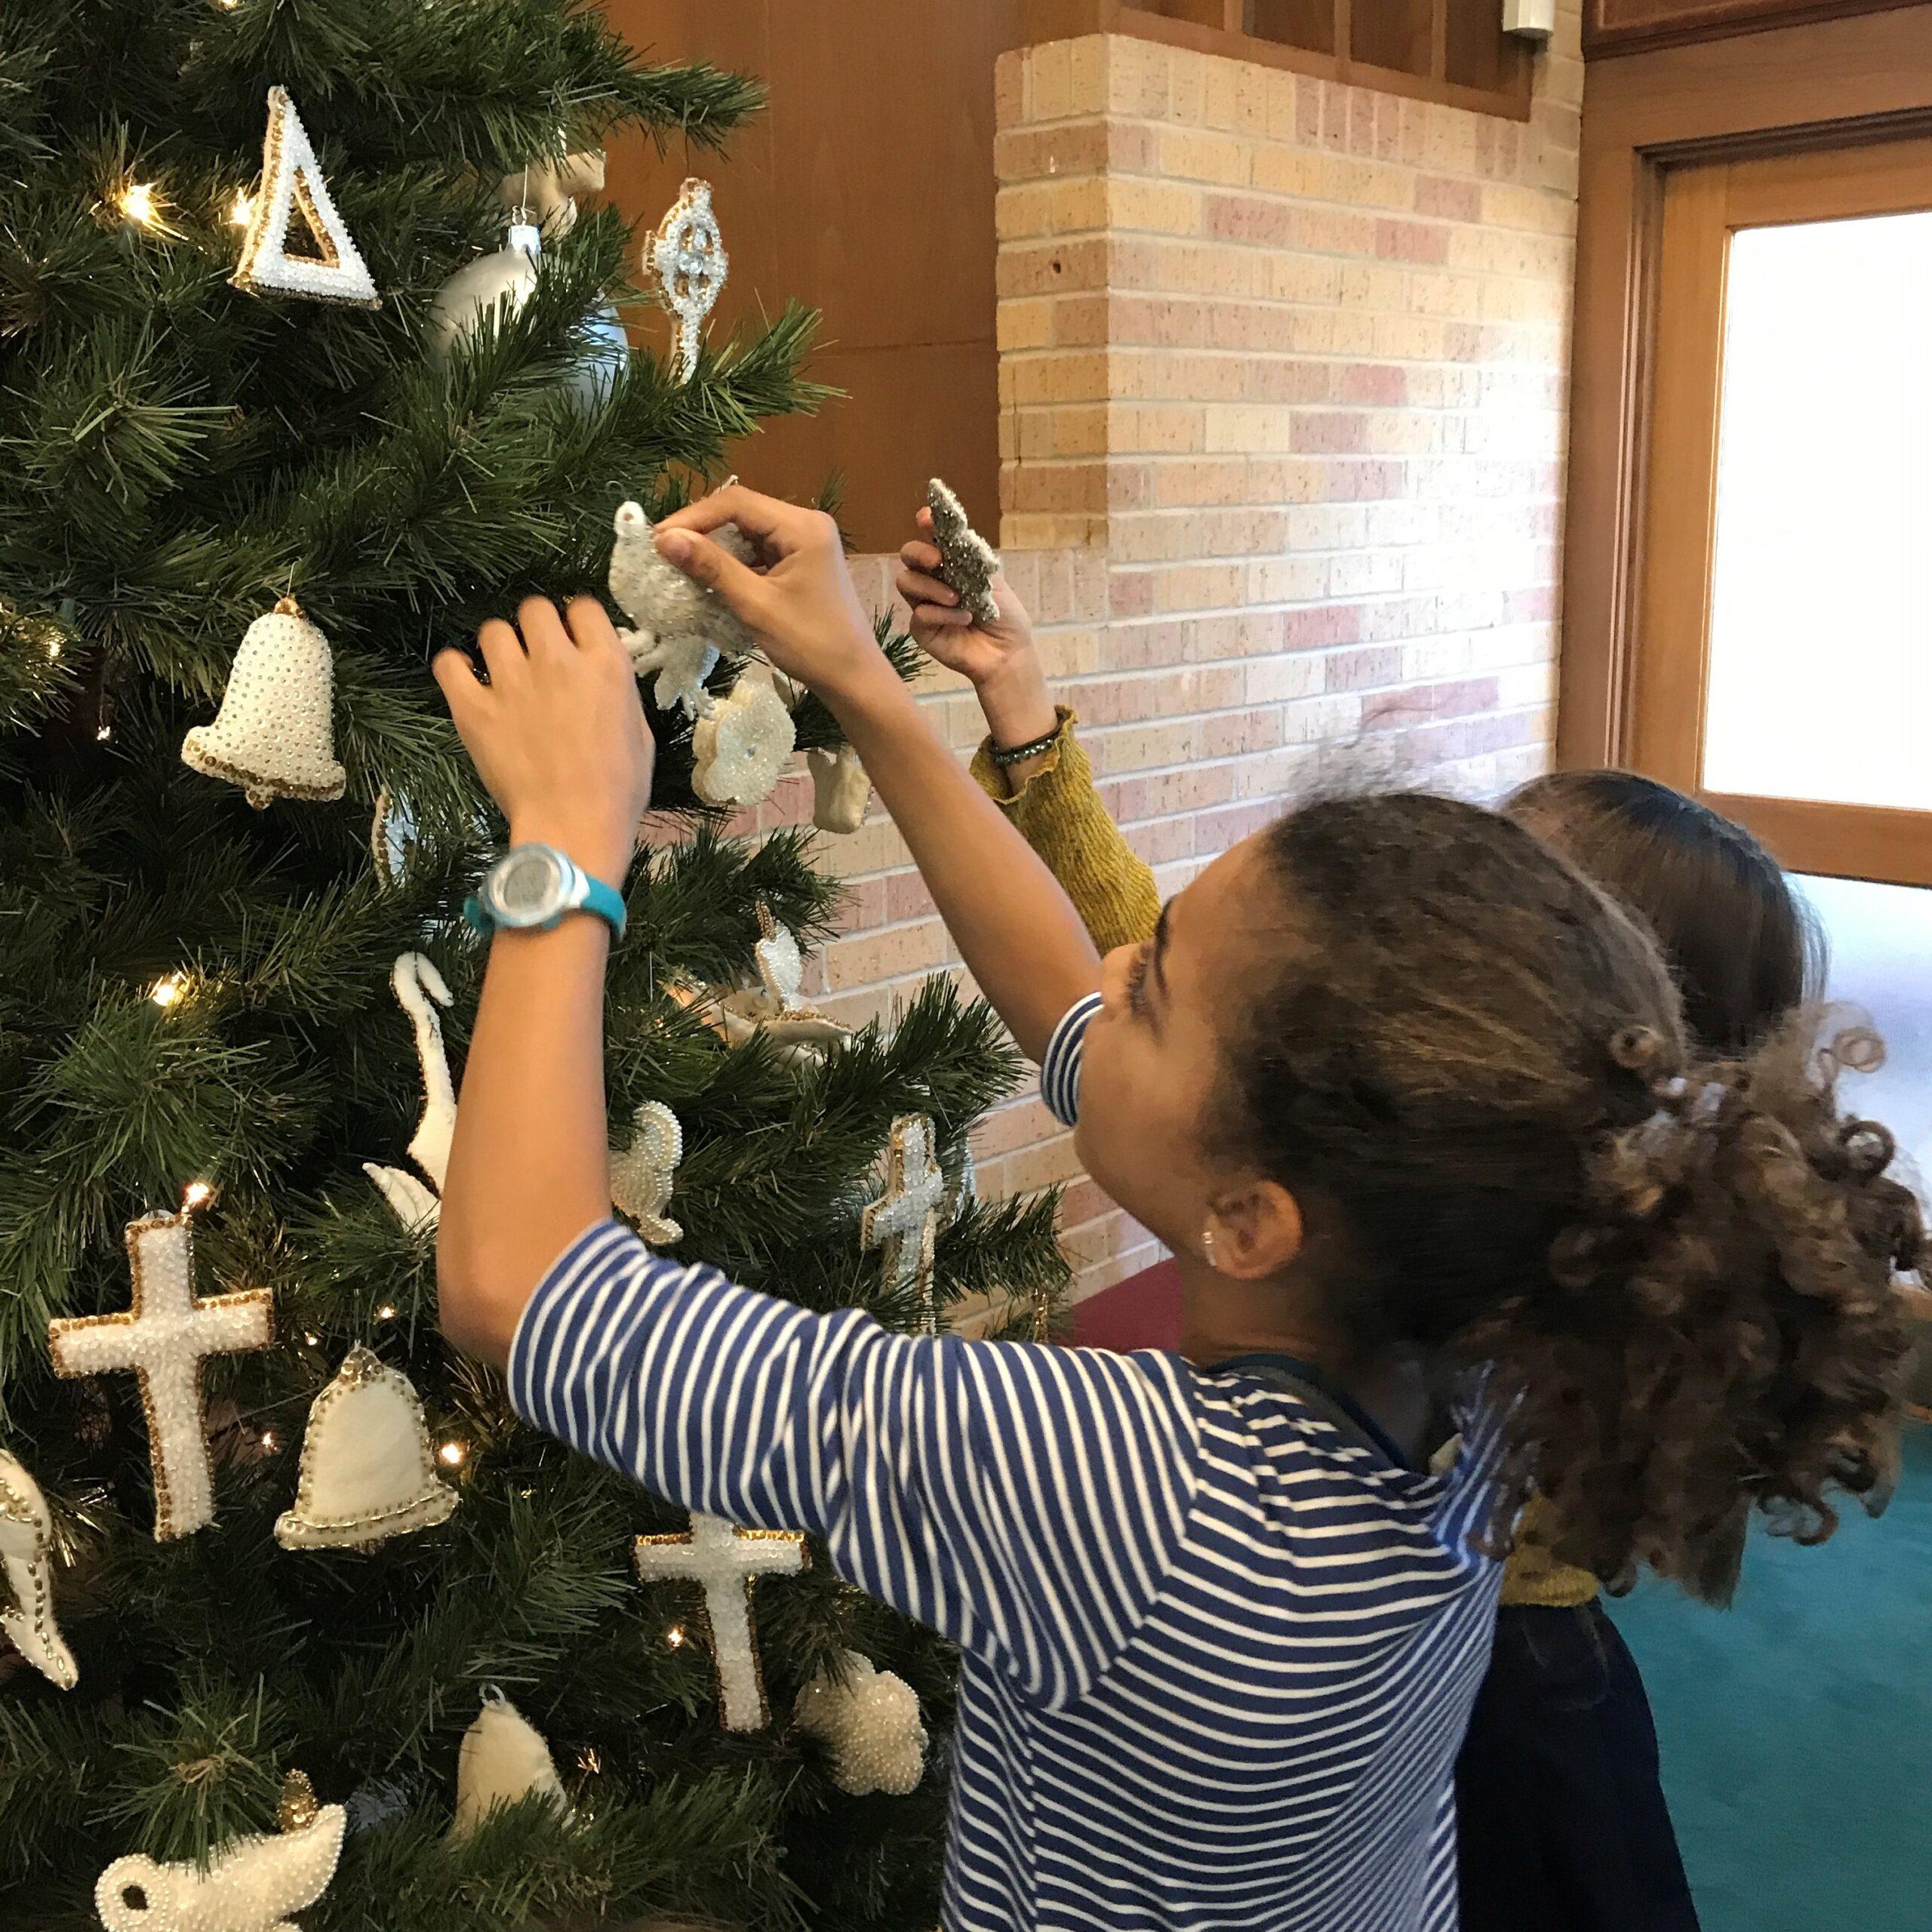 Bell Morton puts Chrismon on Sanctuary Christmas tree